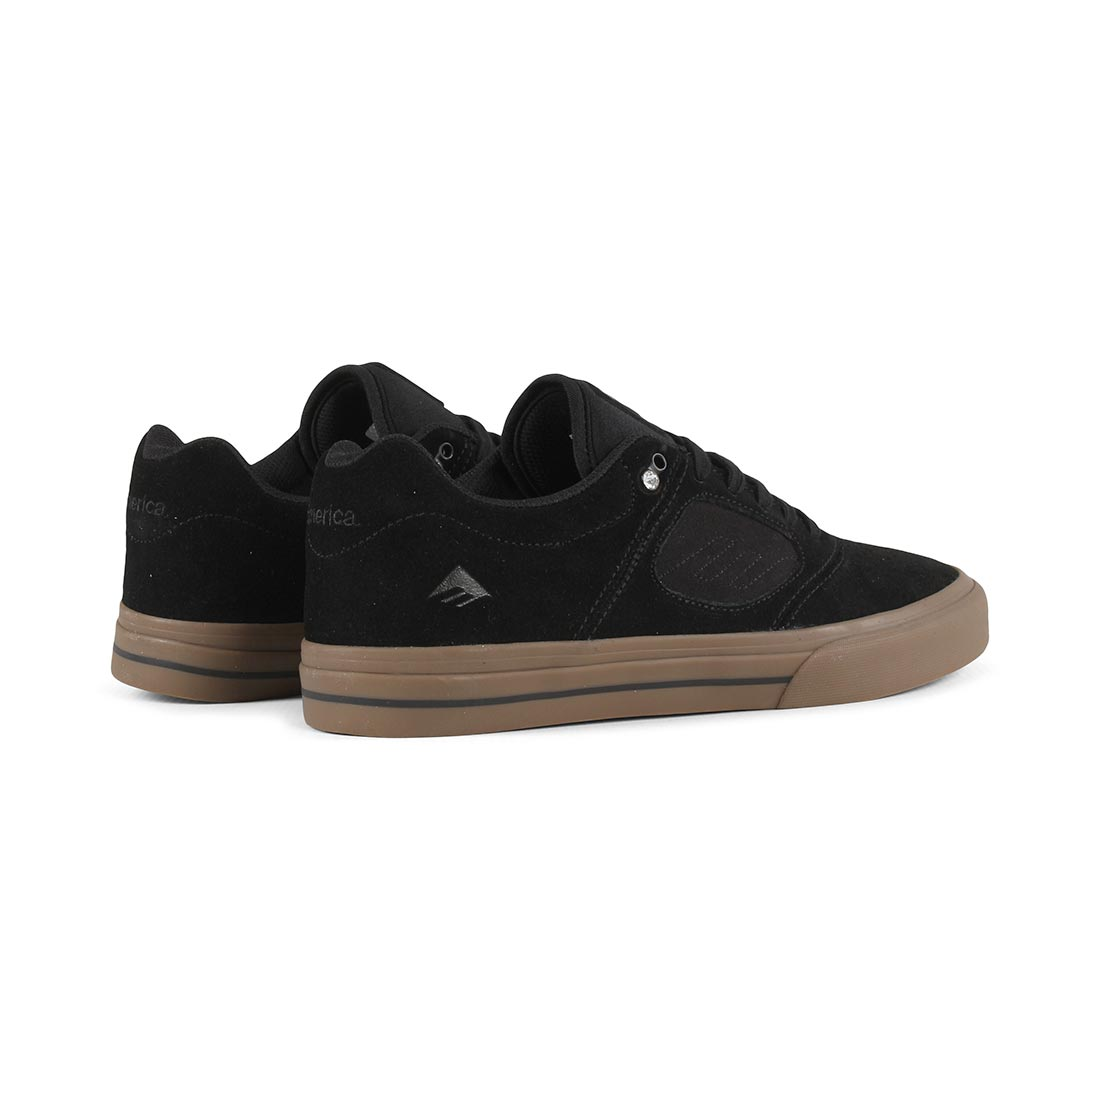 02b3083efcf Emerica Reynolds 3 G6 Vulc Shoes - Black   Gum